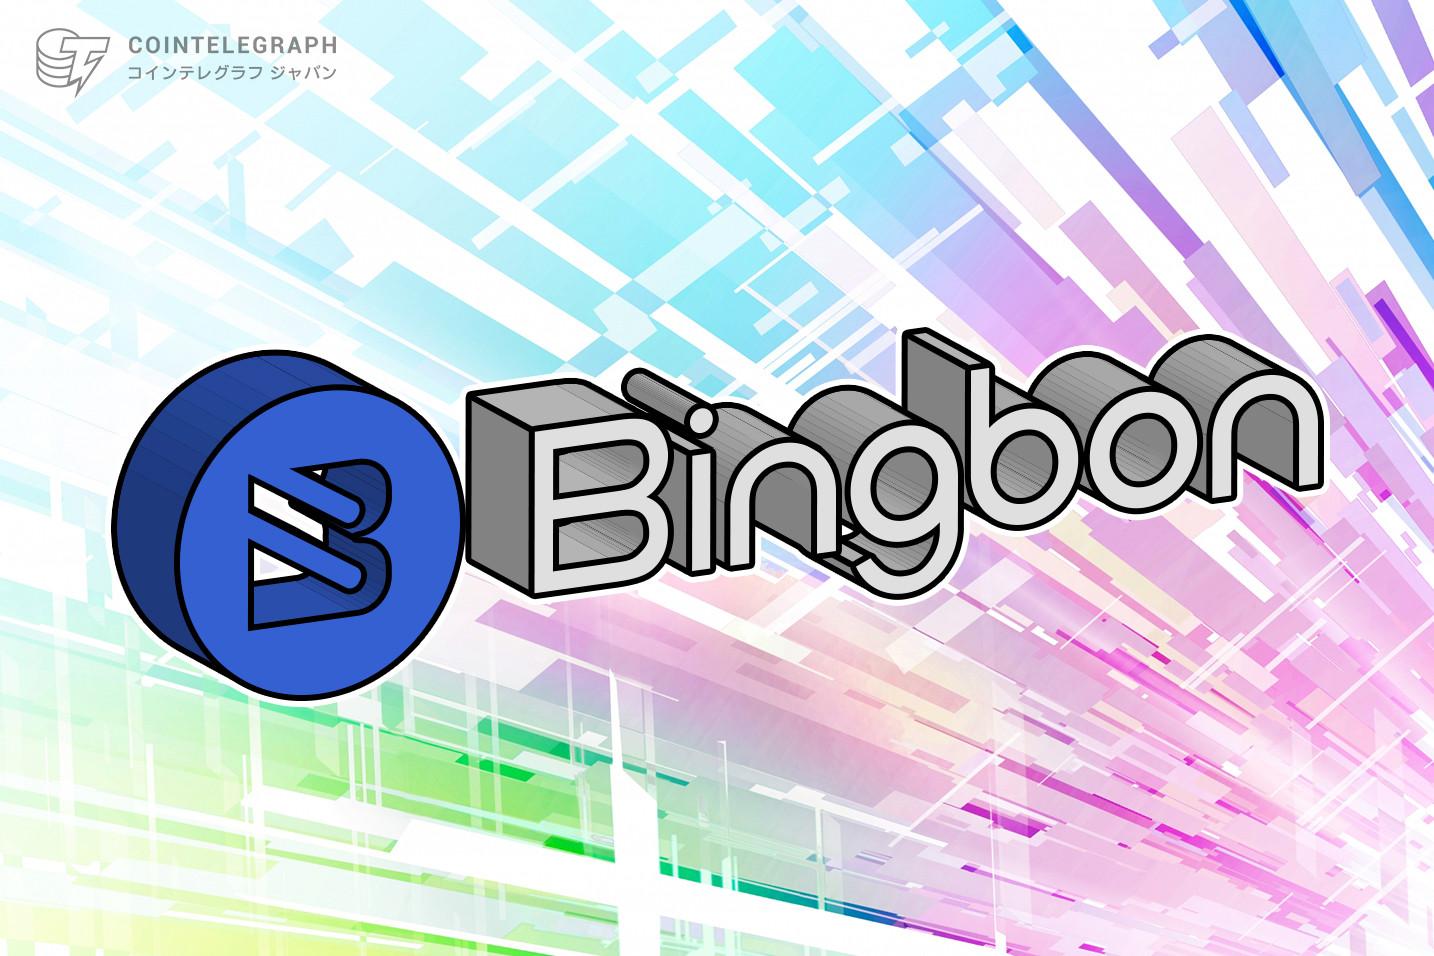 Bingbonソーシャルプラットフォームー製品更新、コピー注文強化、初心者向けからプロ向けへの邁進